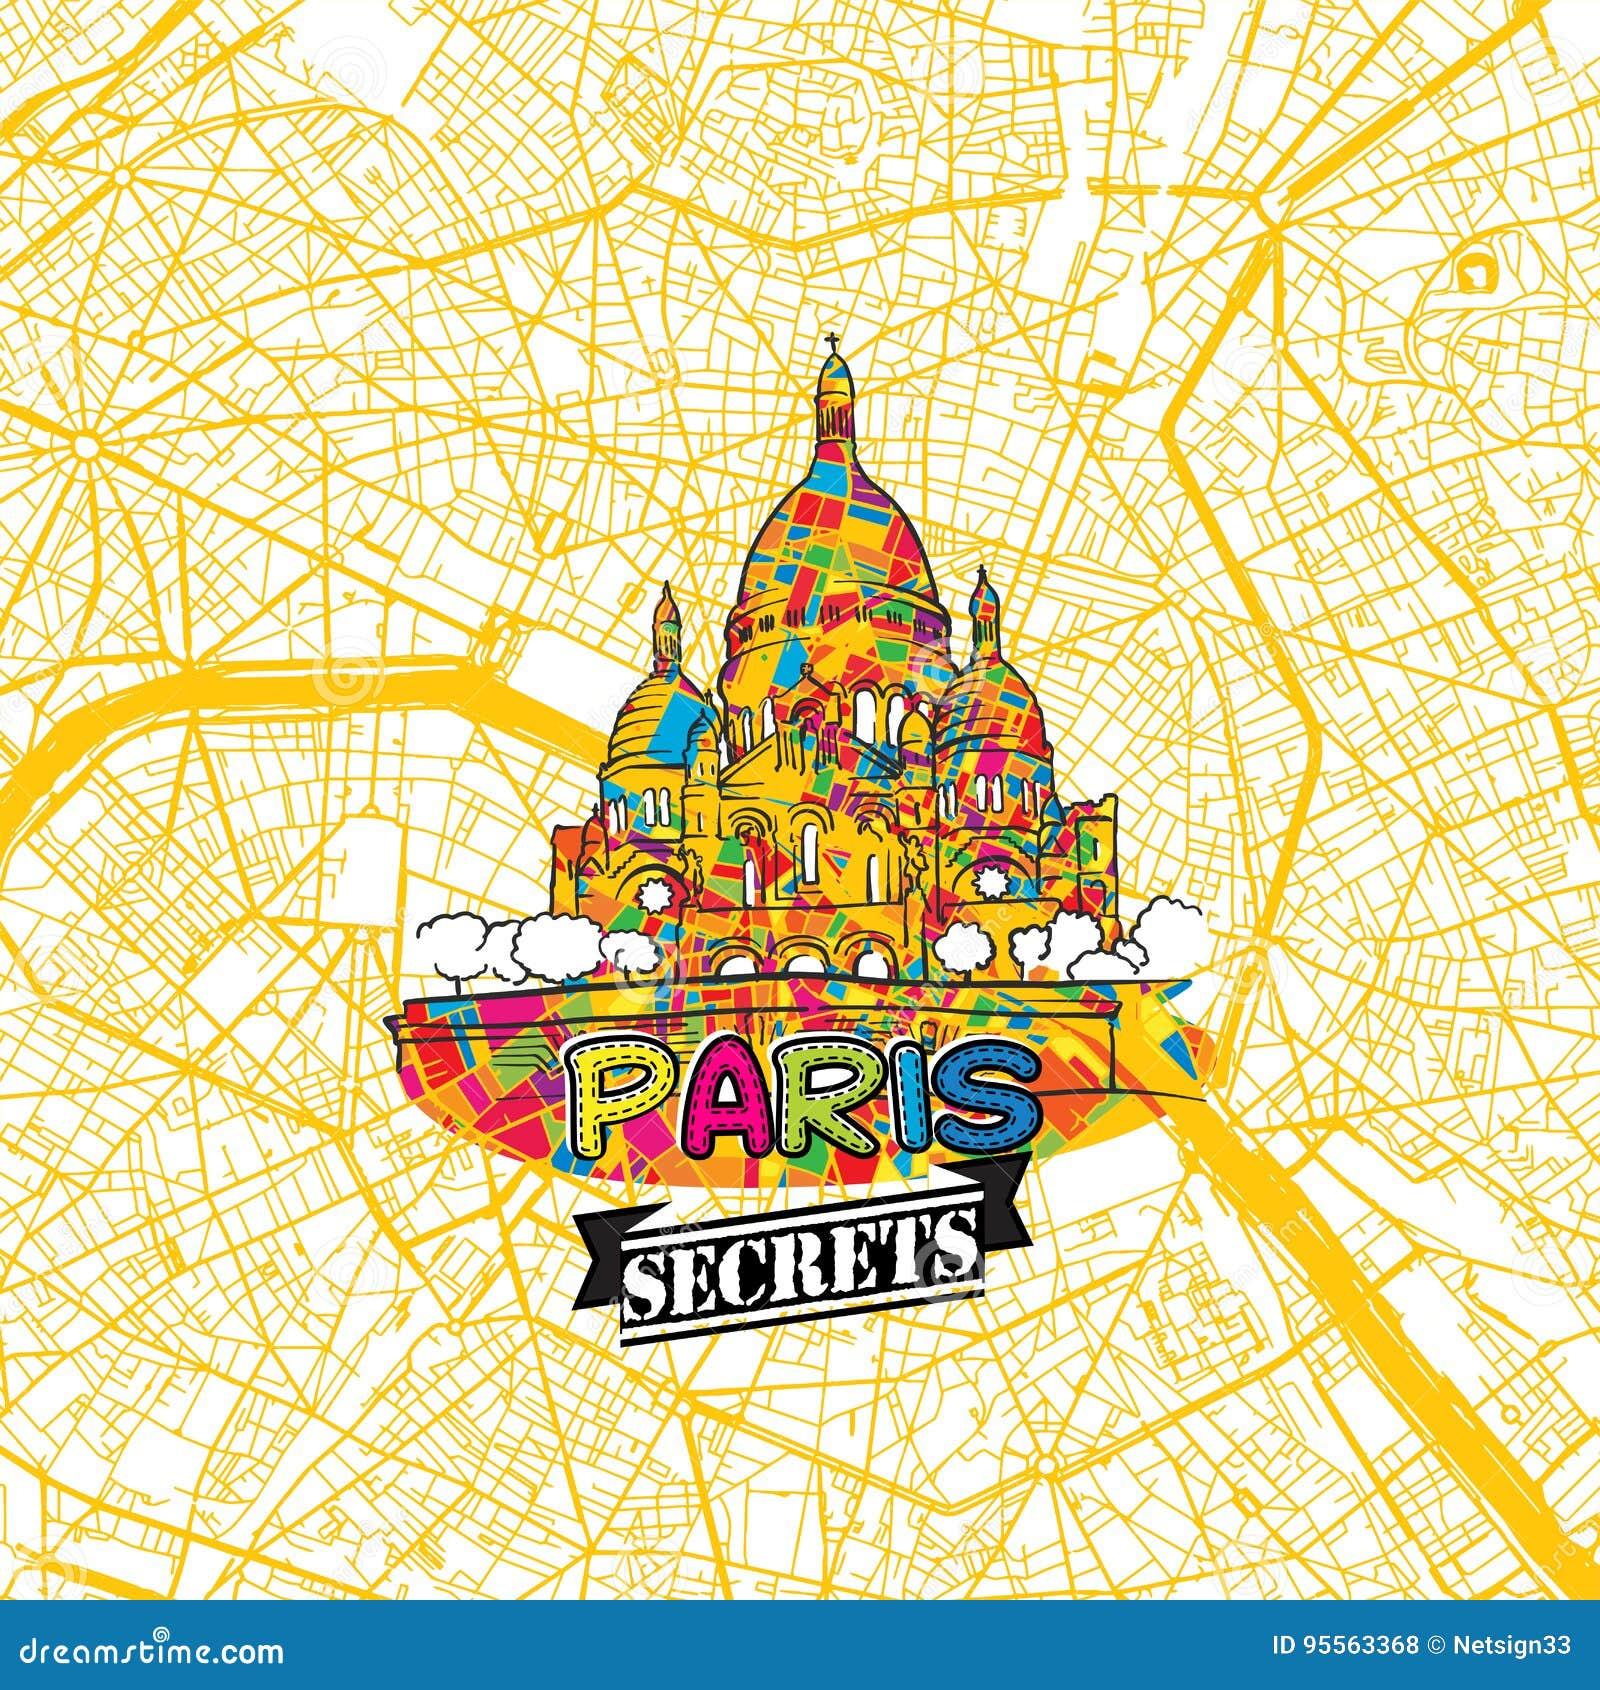 Paris Travel Secrets Art Map Stock Vector Illustration Of Modern - Modern map of paris